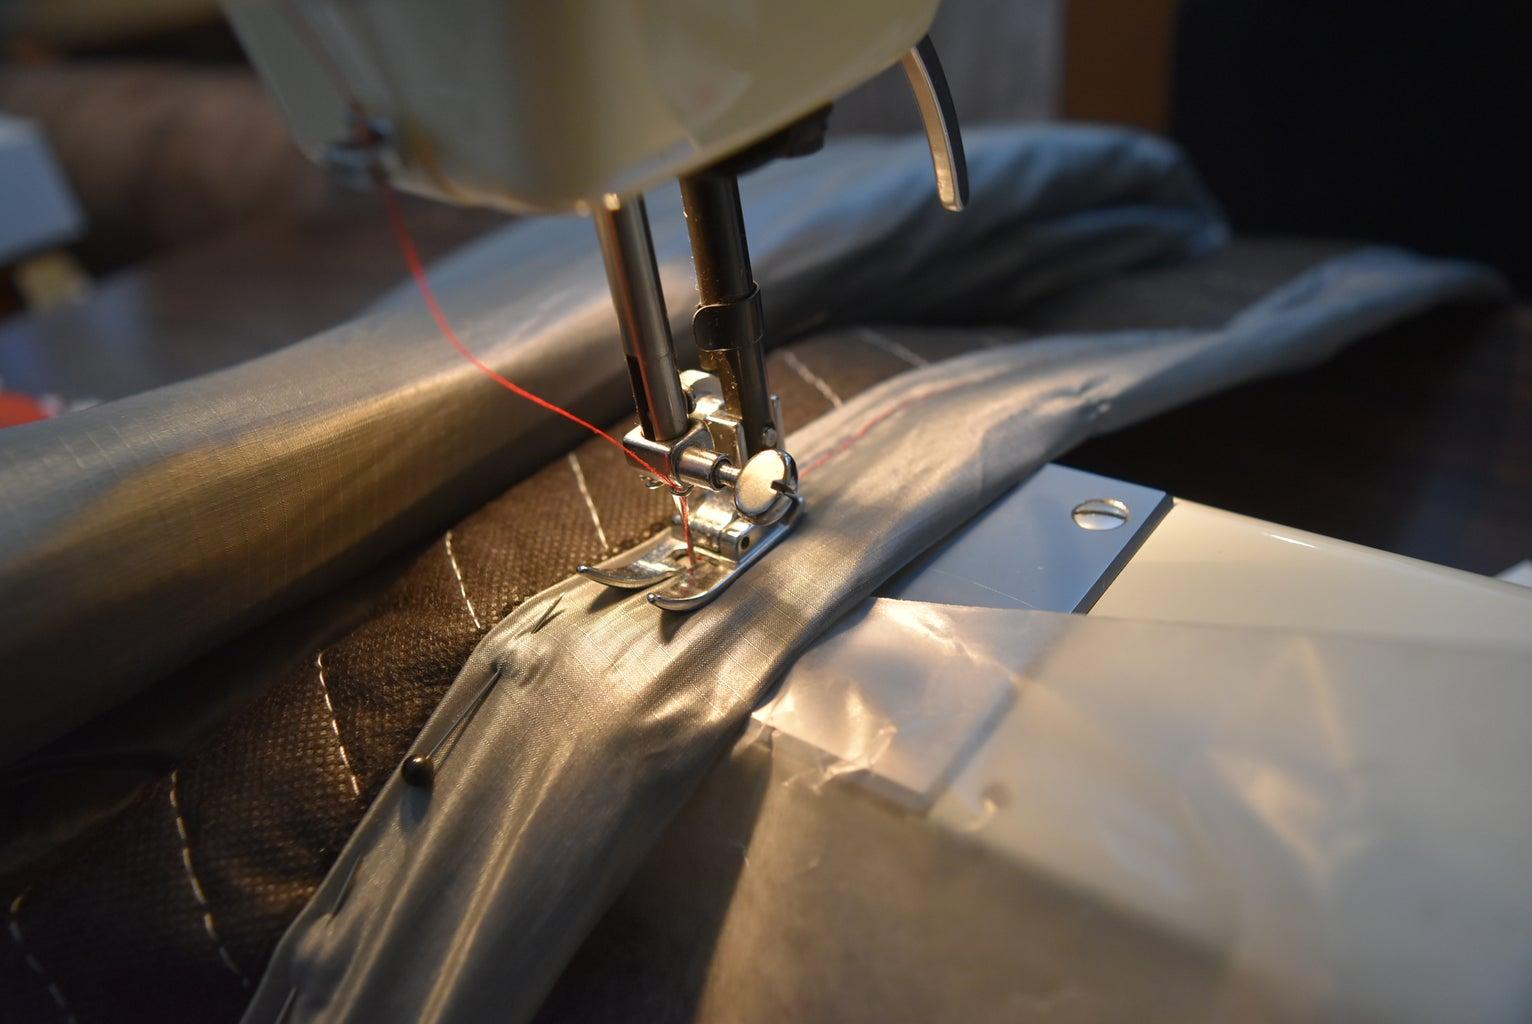 Step 4: Stitch/ Sew